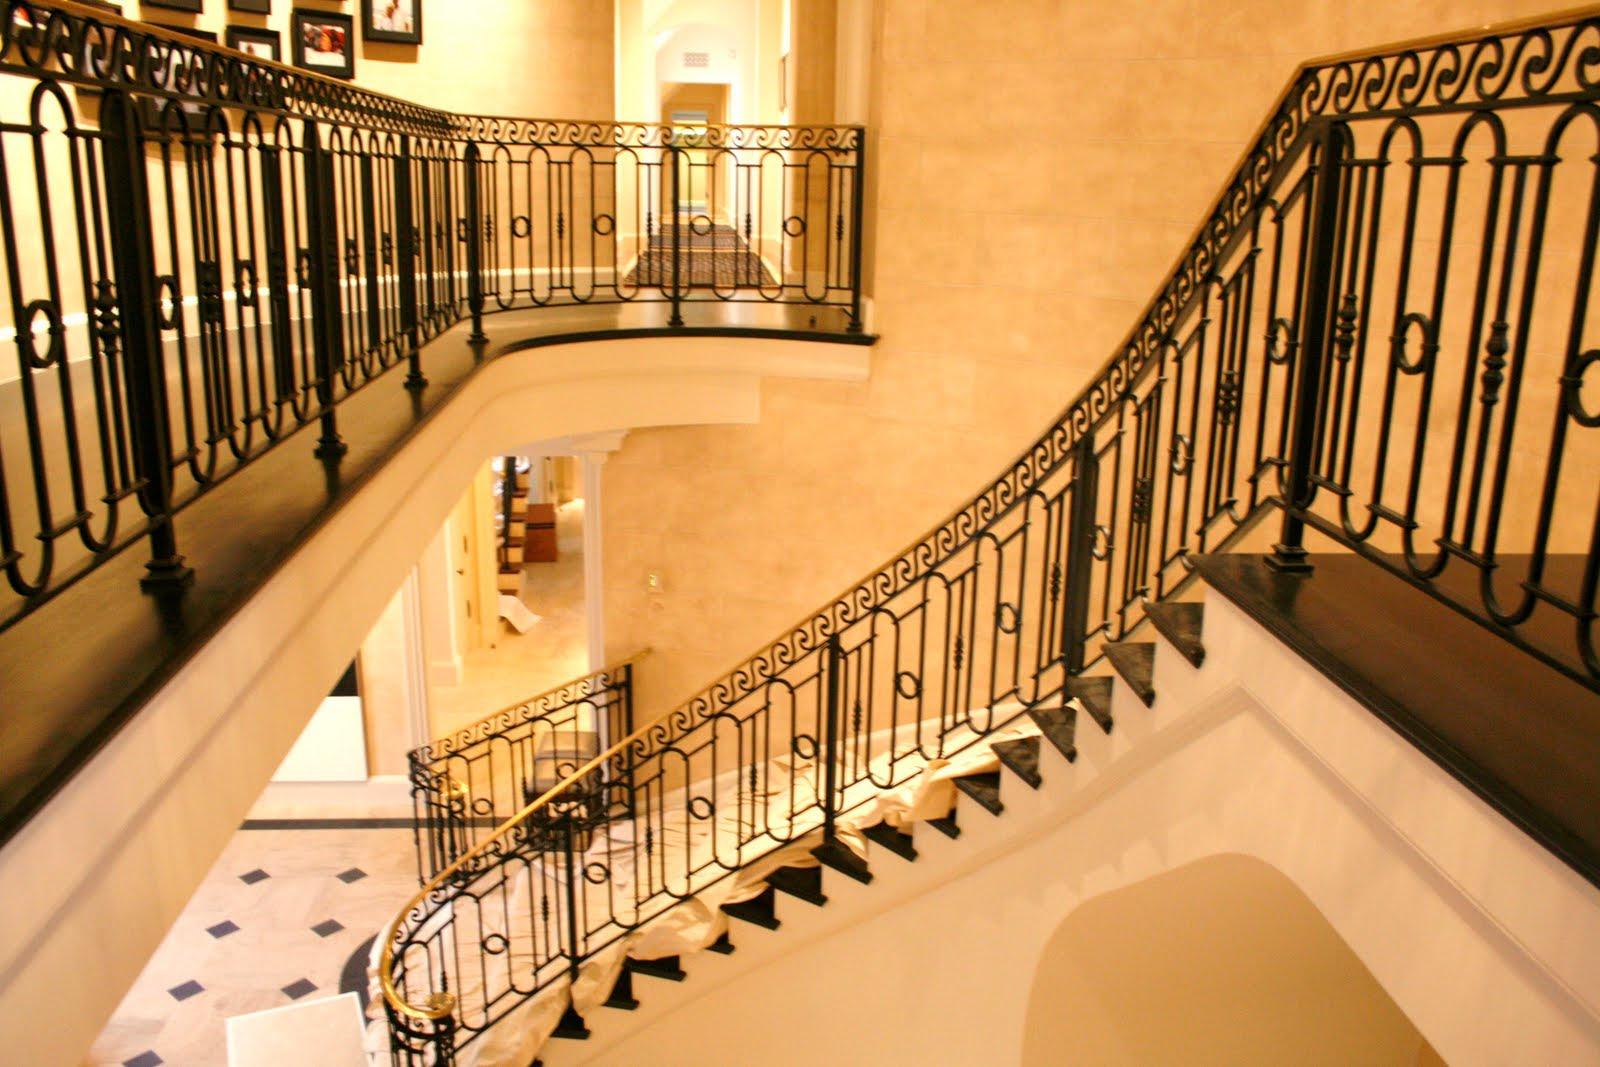 Wrought Iron Stair Railings Interior Newsonair Org Living Room Decoration Ideas